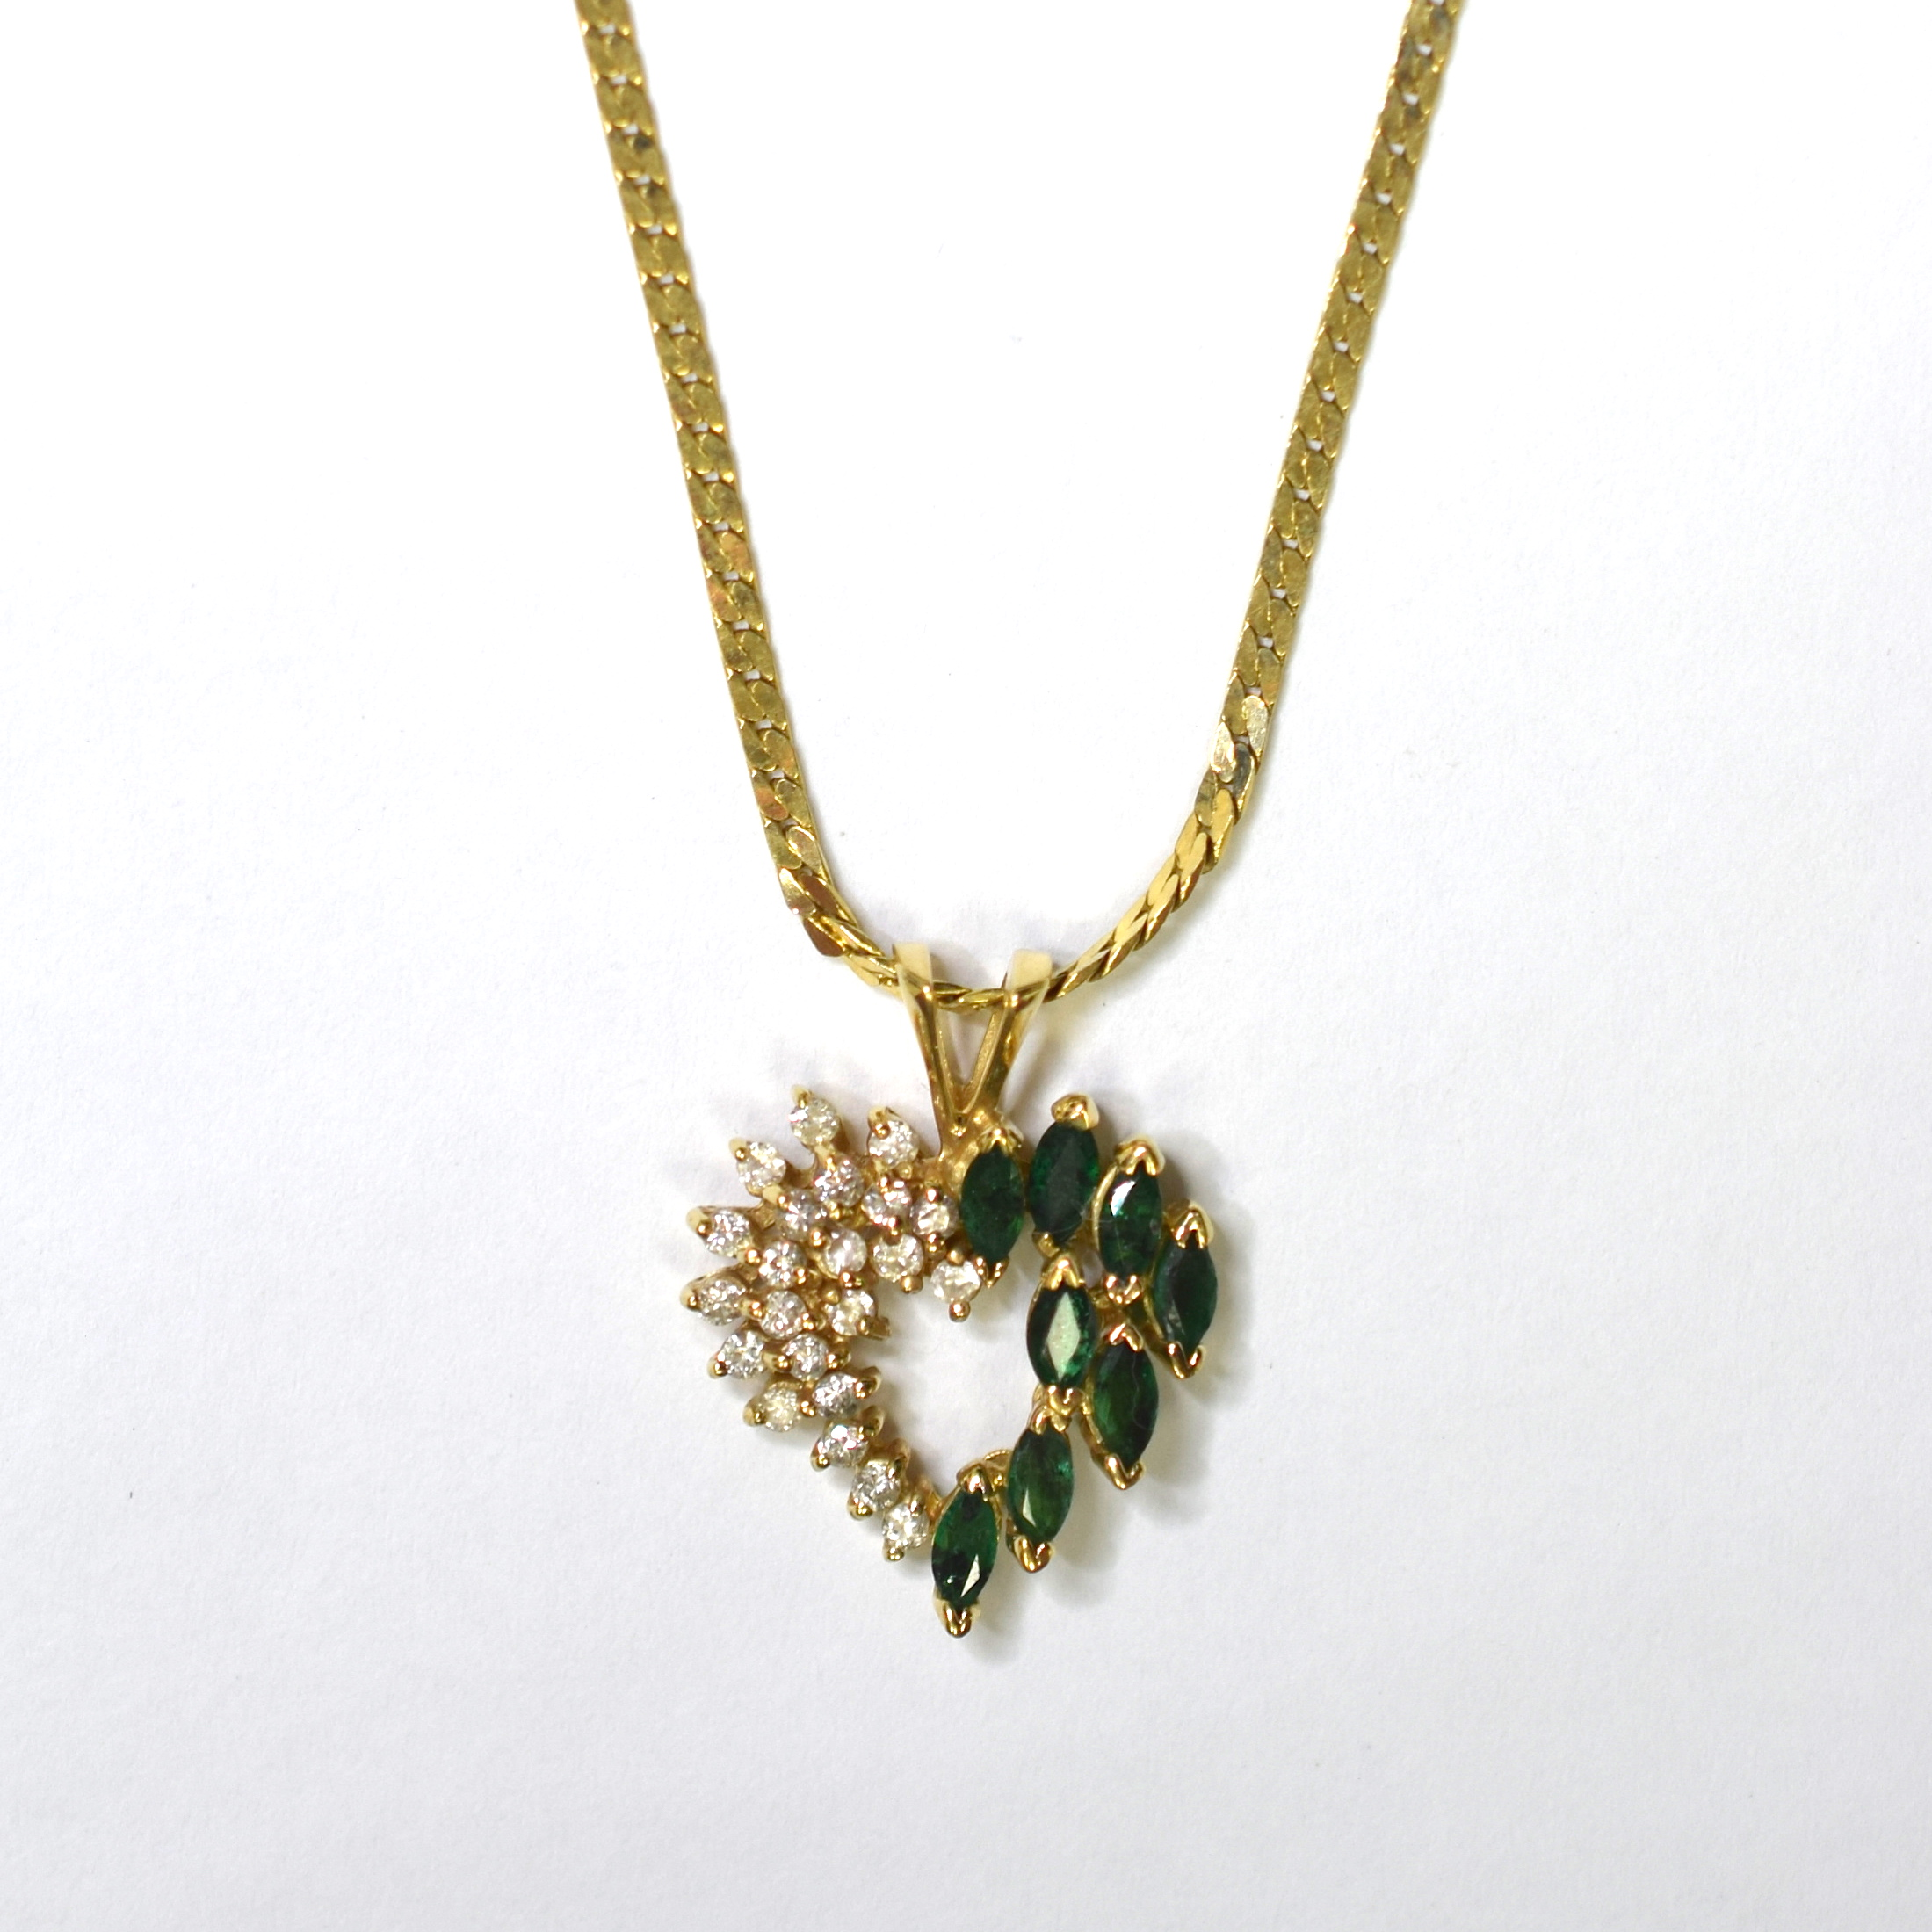 14k yellow gold 630 grams emerald and diamond heart pendant with 14k yellow gold 630 grams emerald and diamond heart pendant with gold chain aloadofball Images